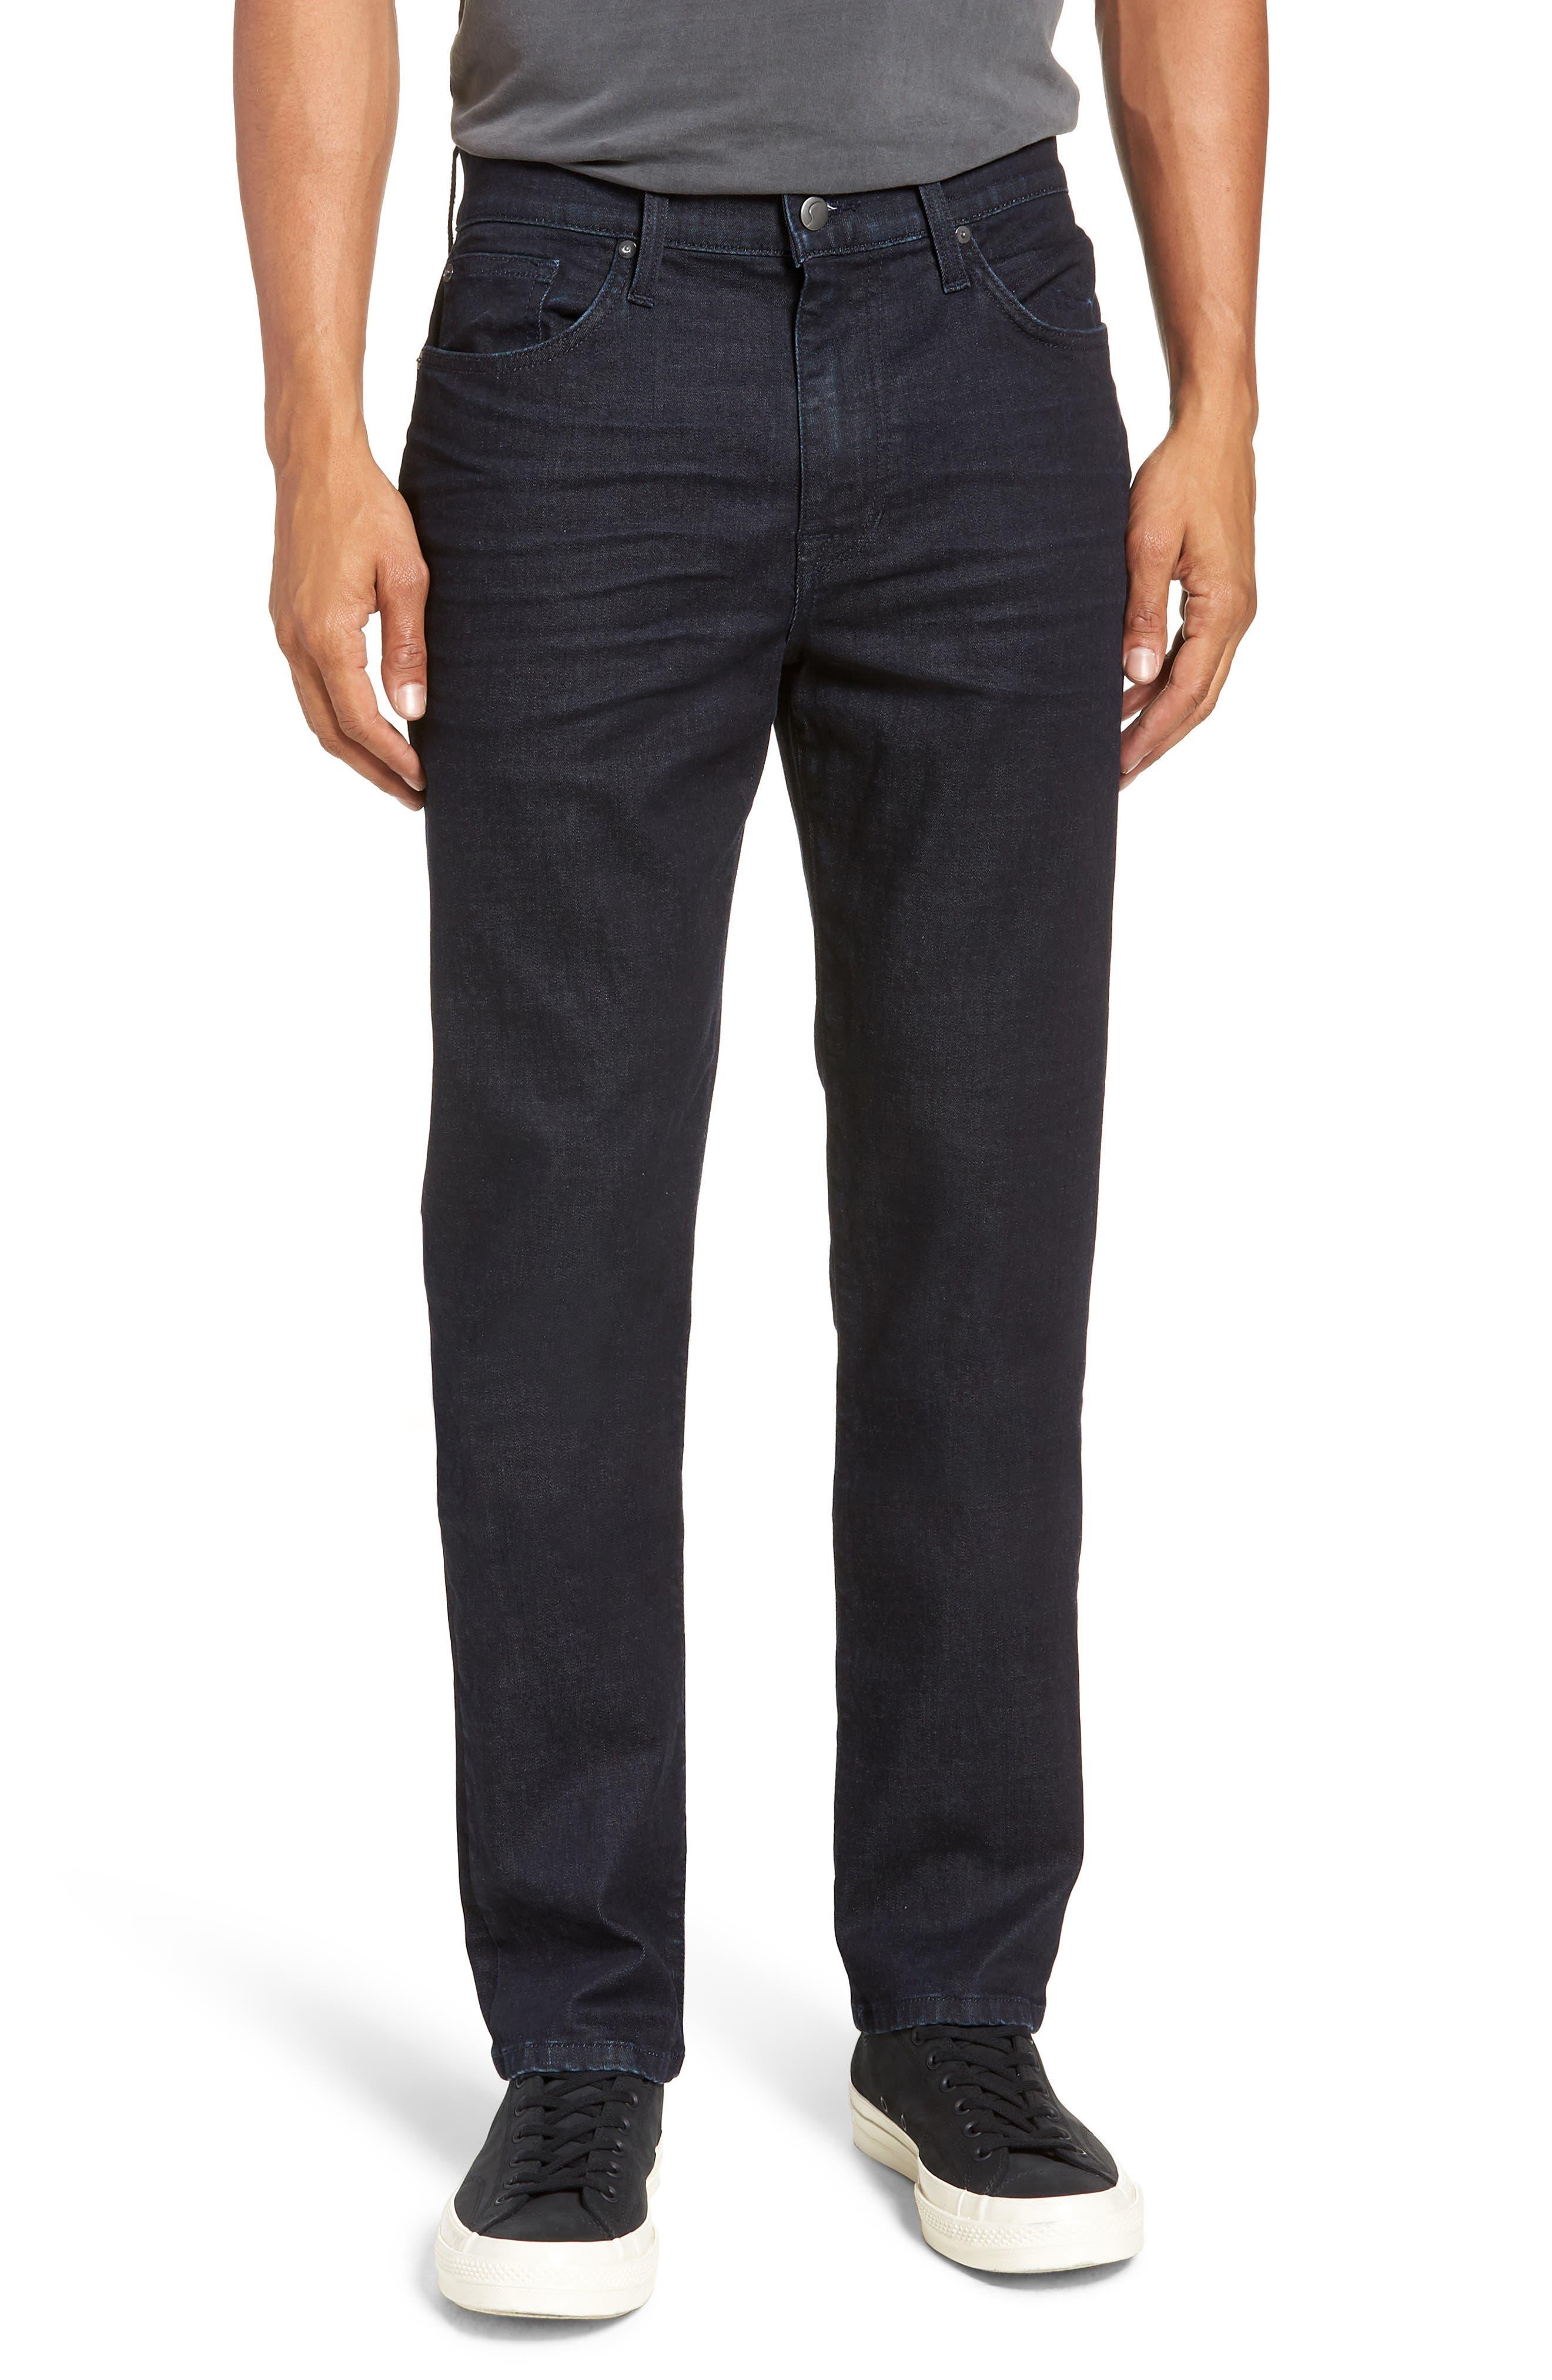 Folsom Slim Fit Jeans,                             Main thumbnail 1, color,                             DOM